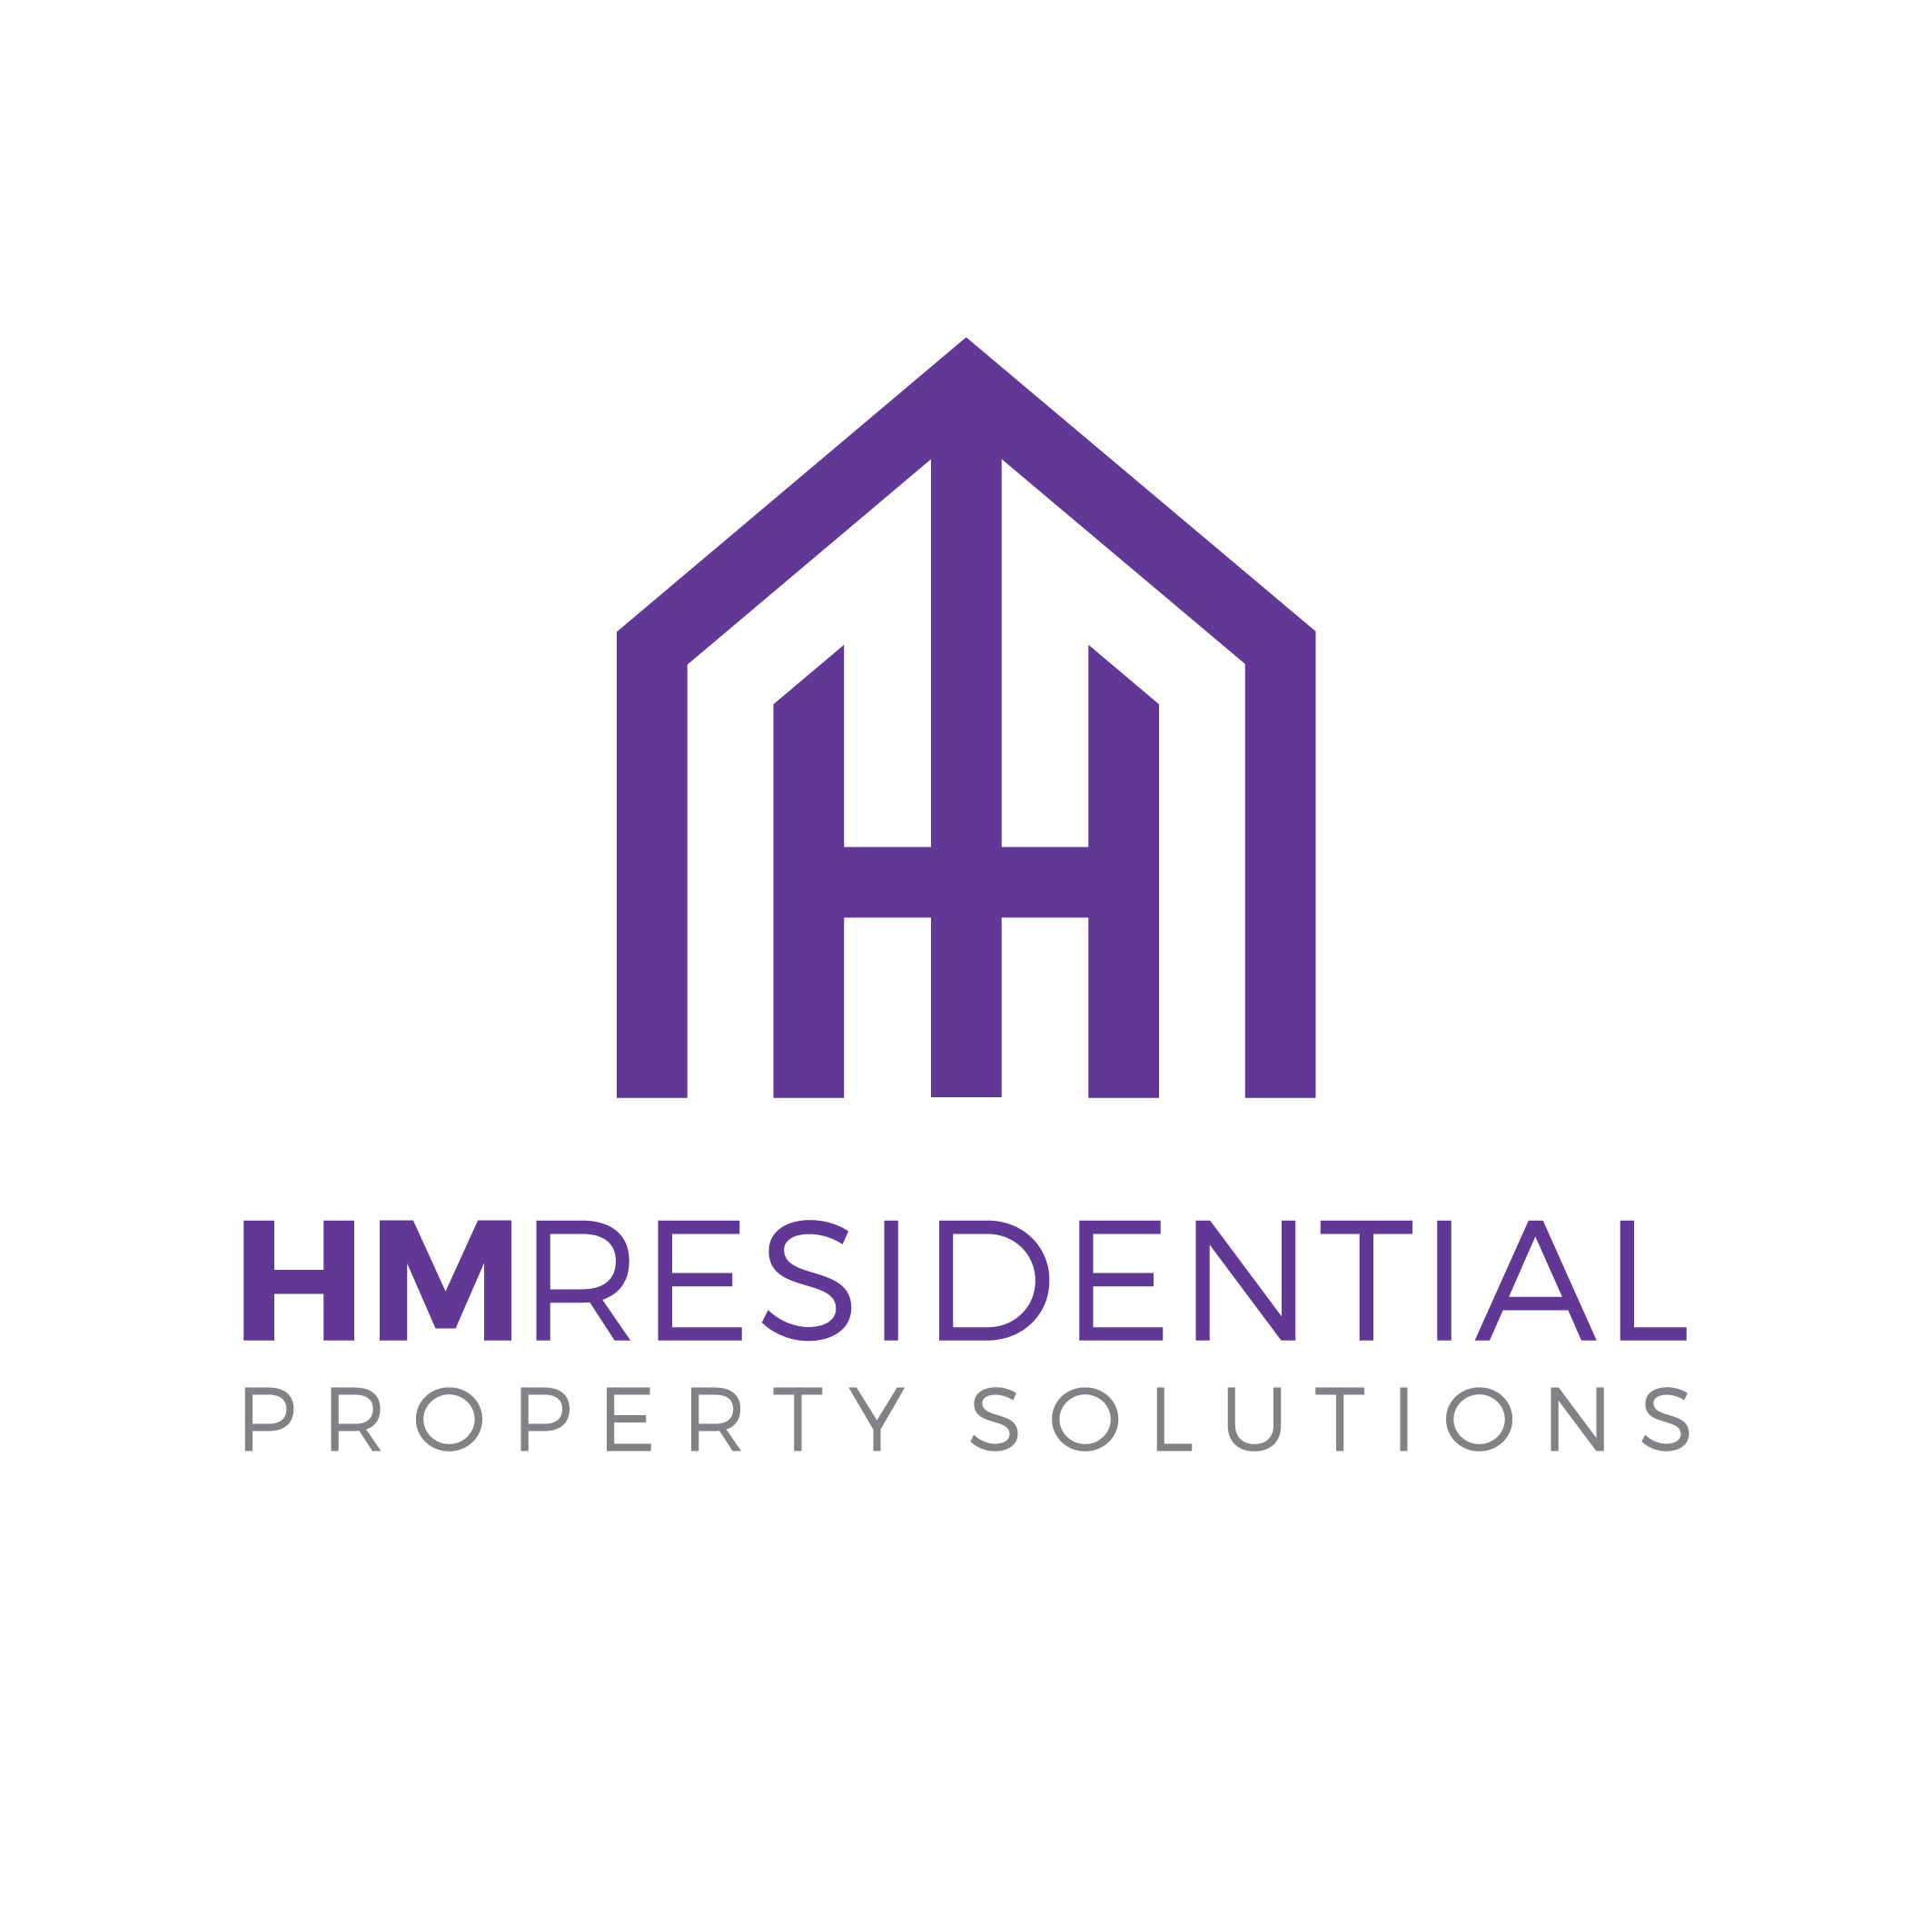 HM Residential